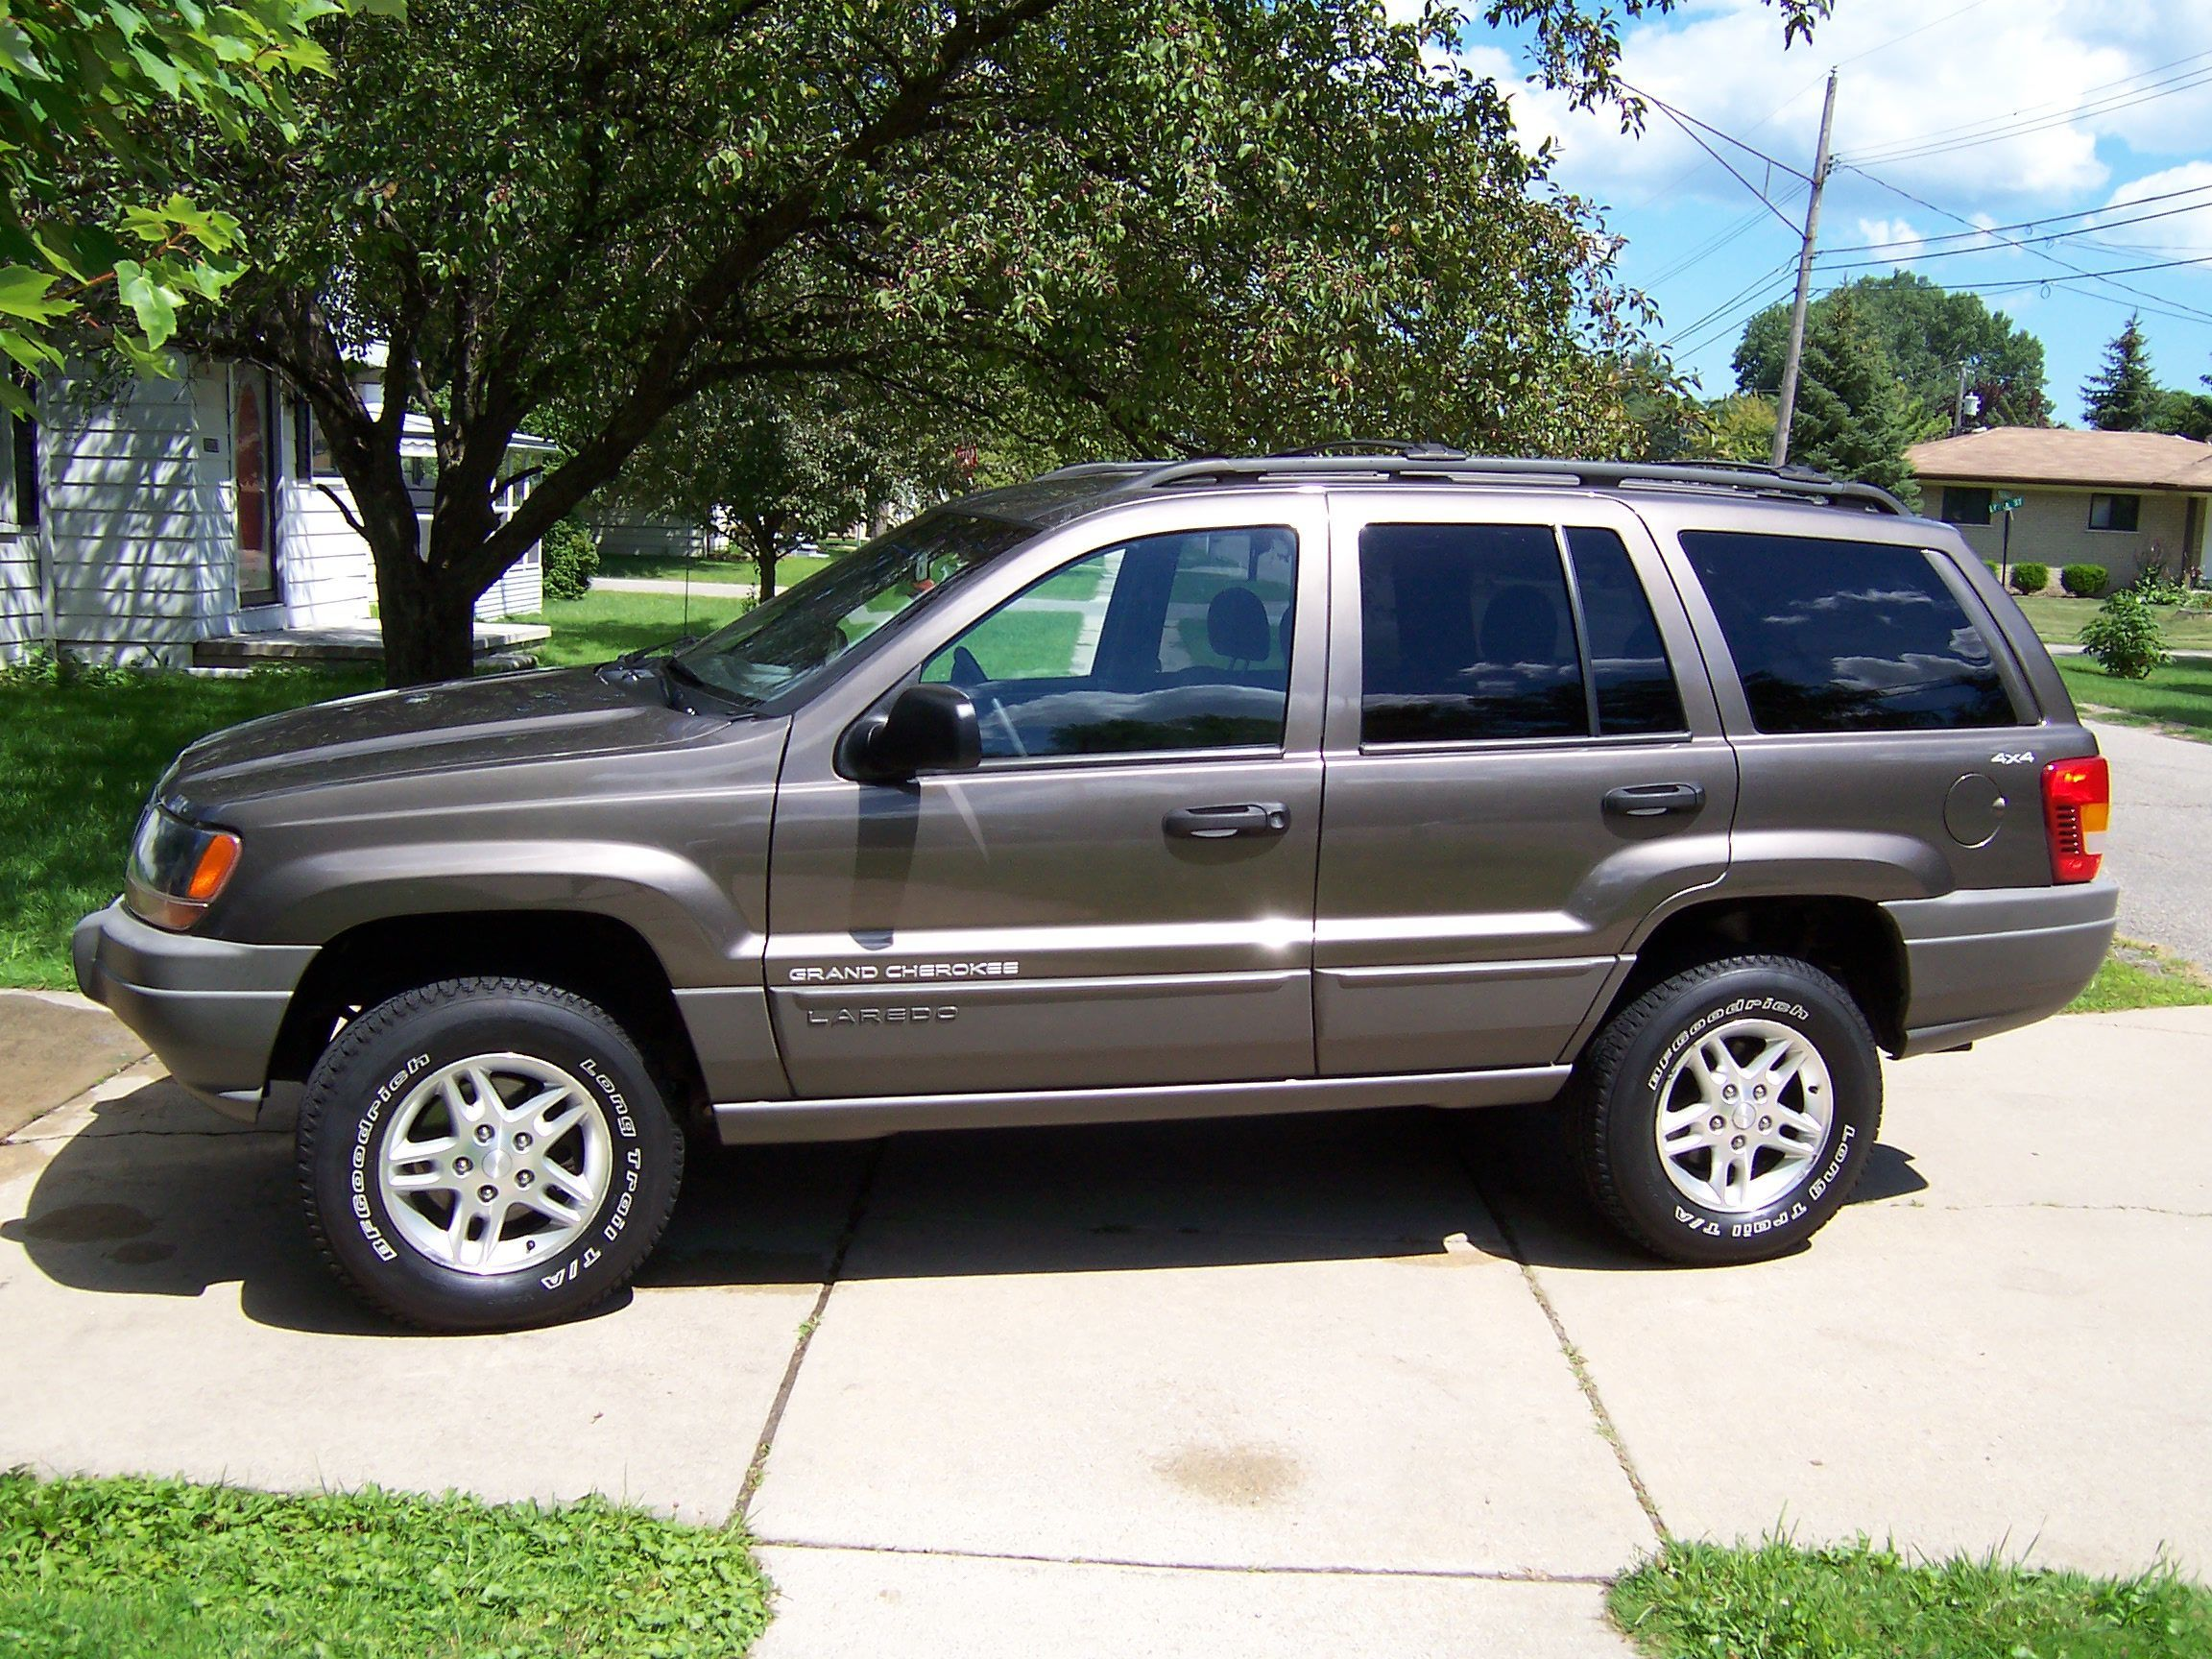 hight resolution of 1999 jeep grand cherokee wj w dana 44 3 73 ratio hydro lok rear and dana 30 front axles